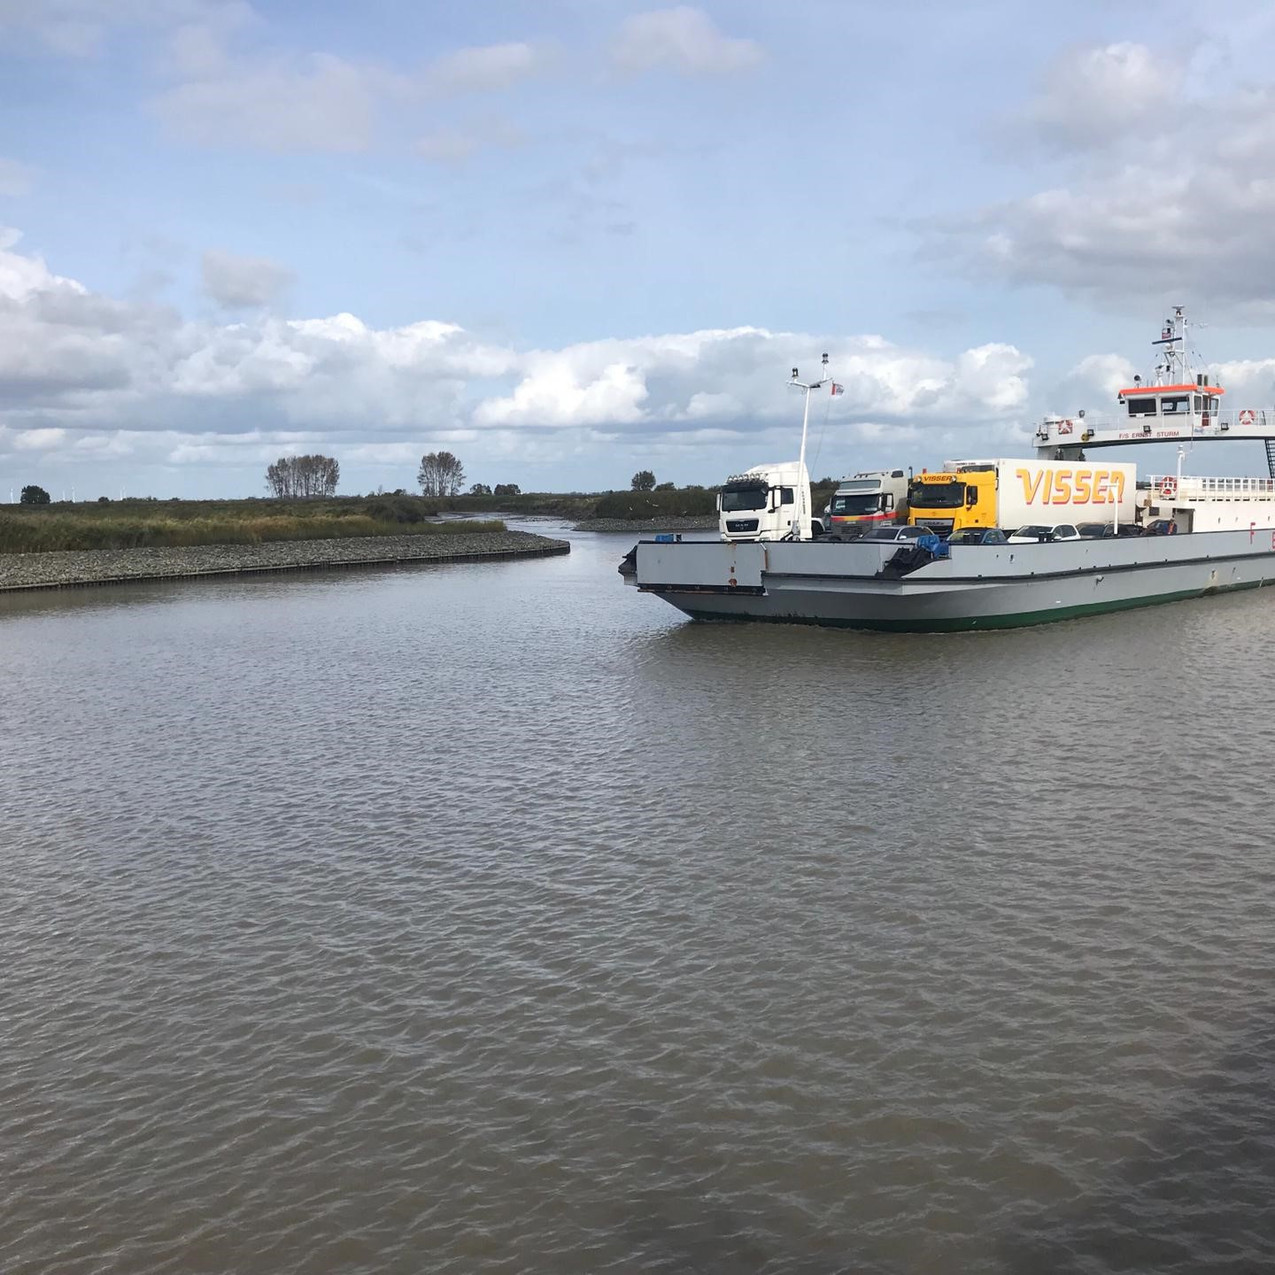 Arbeitsweg per Schiff